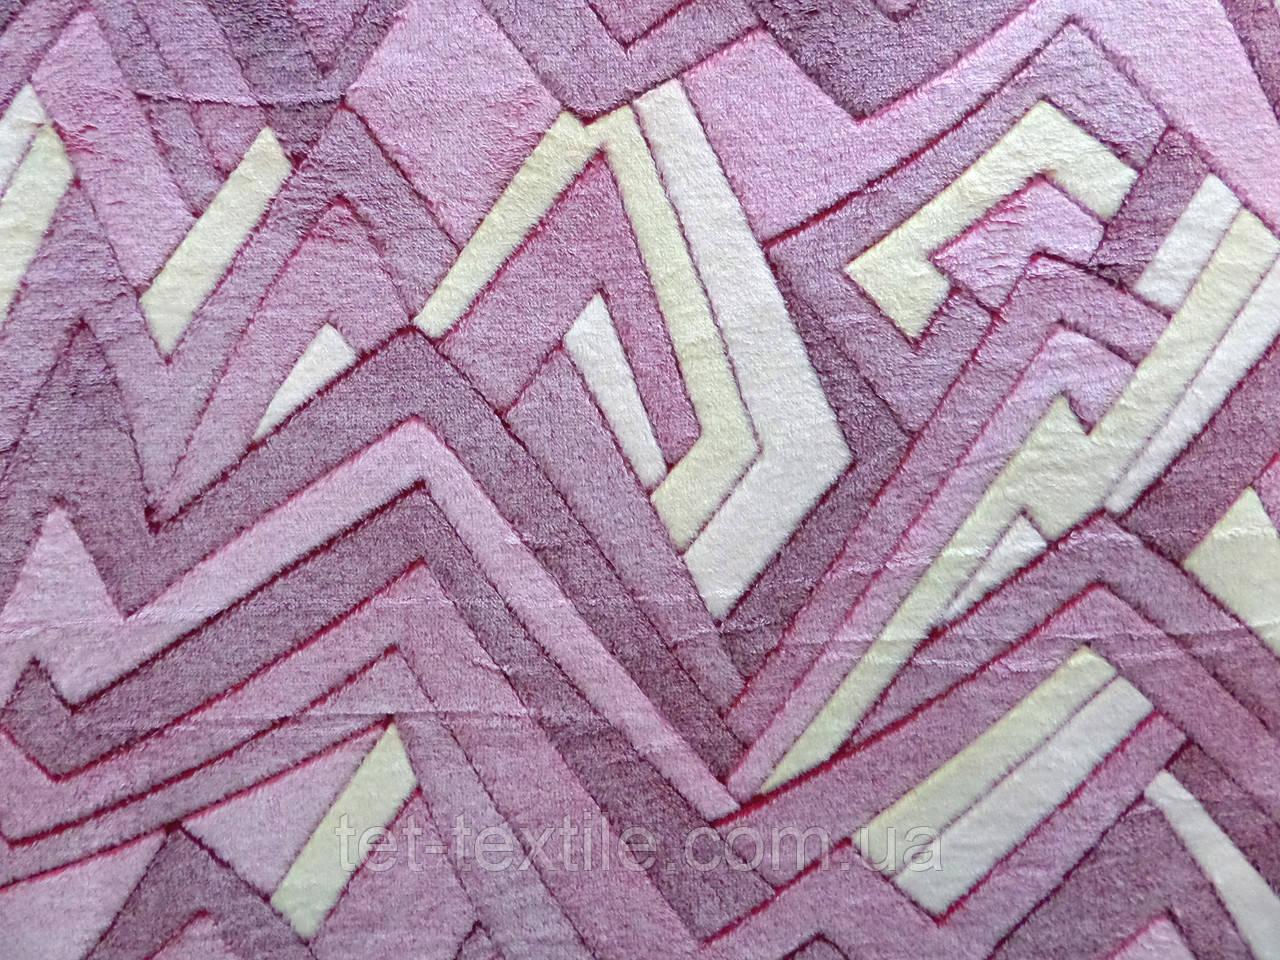 Плед из бамбукового волокна Wellsoft Абстракция розовая (200х220)